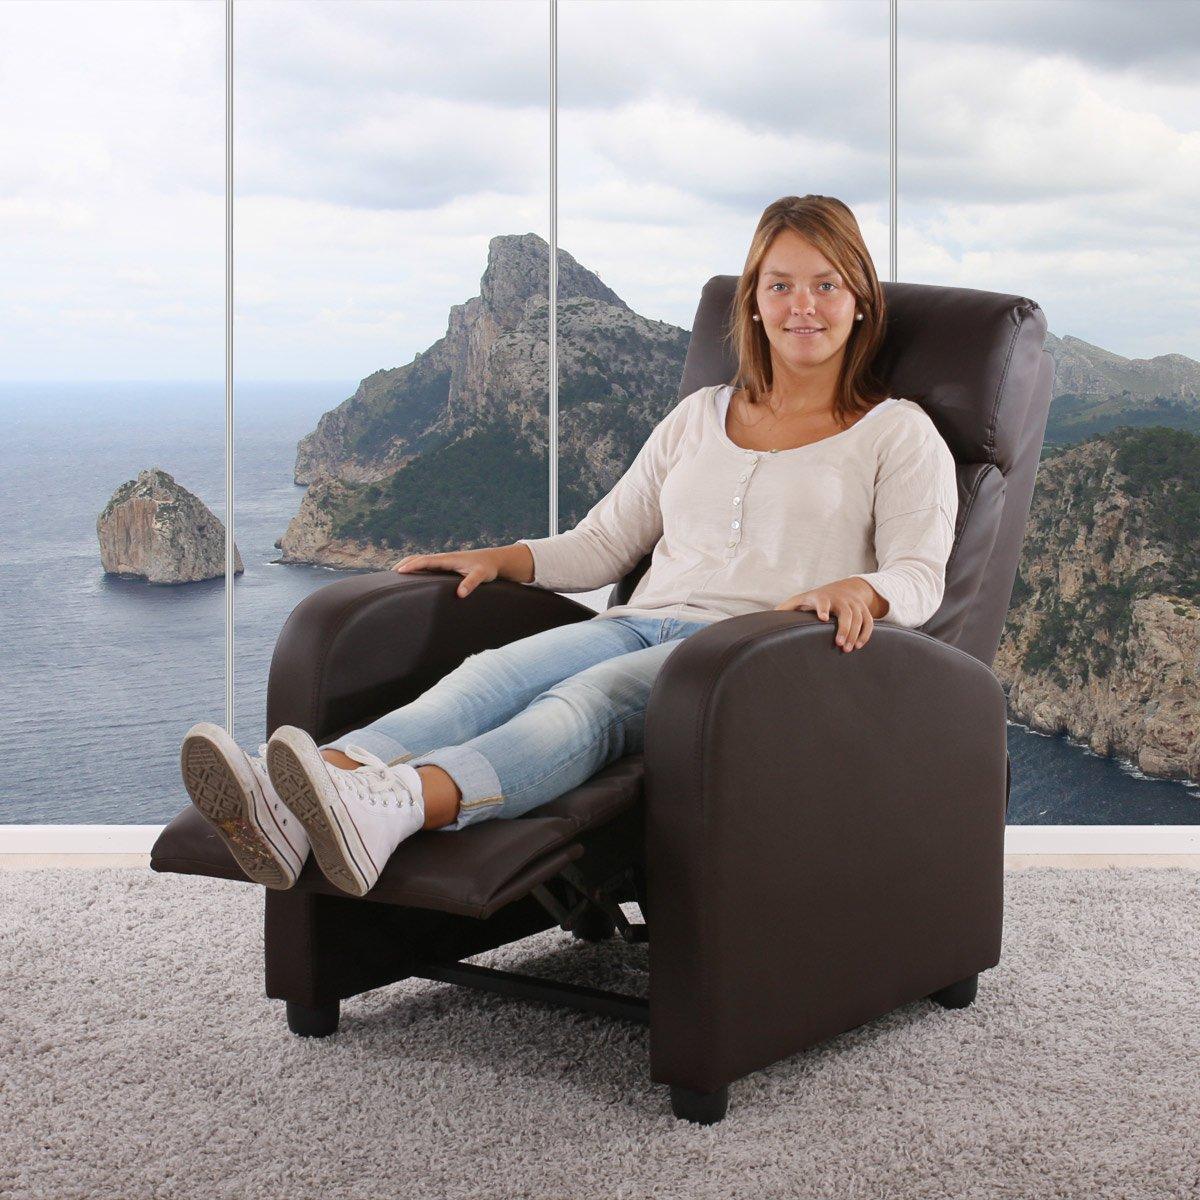 Kunstleder ~ braun Fernsehsessel Relaxsessel Liege Sessel Denver